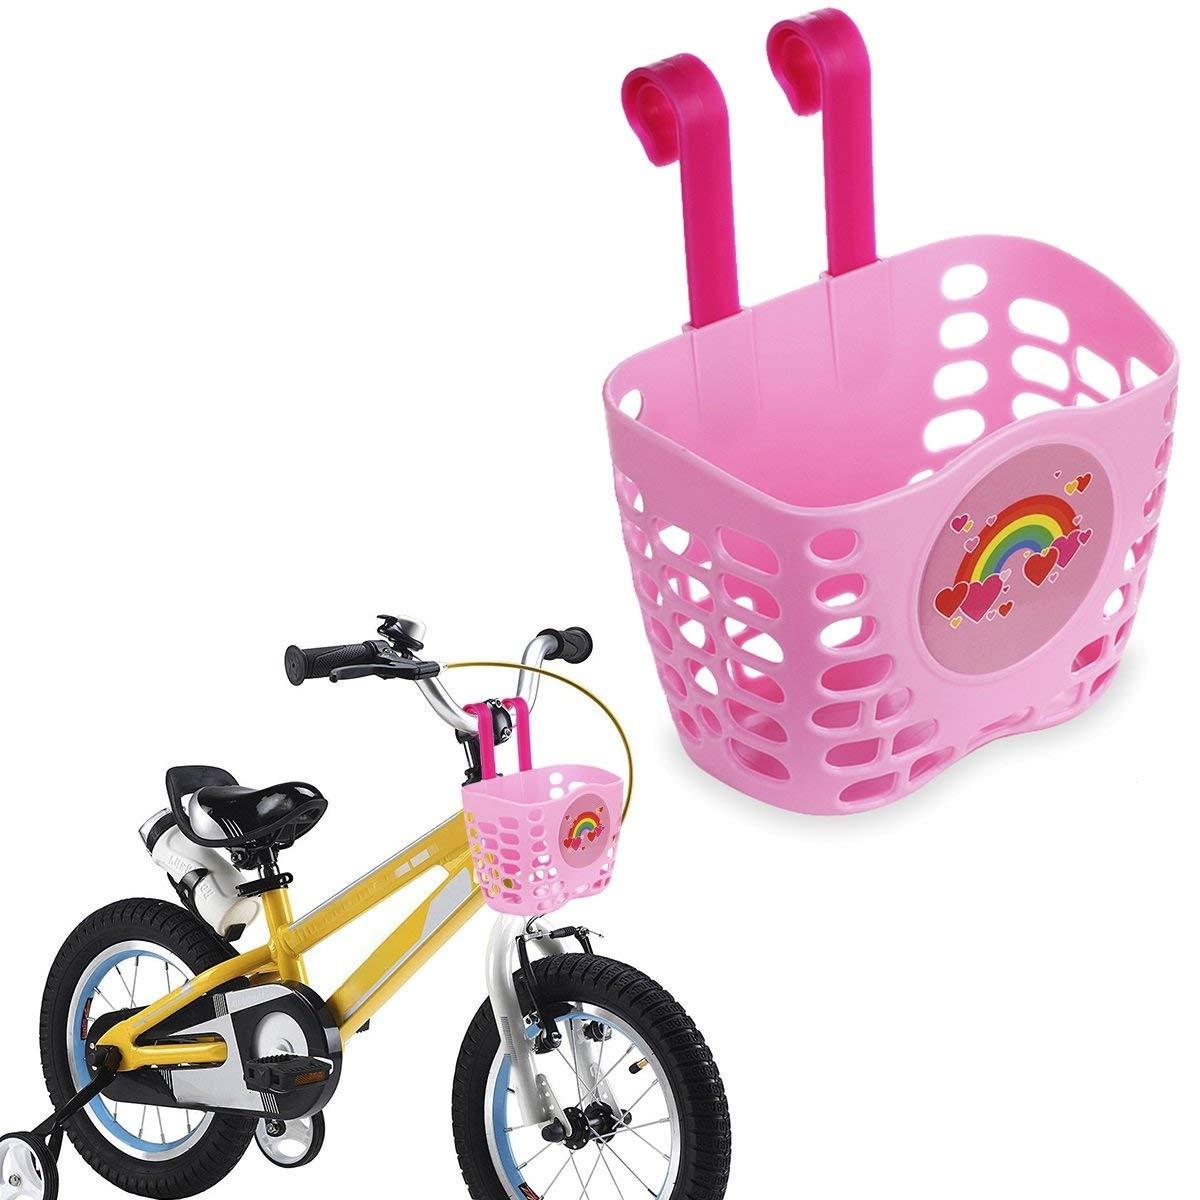 e0b85a892f9 Get Quotations · Mini-Factory Kid's Bike Basket Pink Cute Love Rainbow  Pattern Bicycle Handlebar Basket for Girls